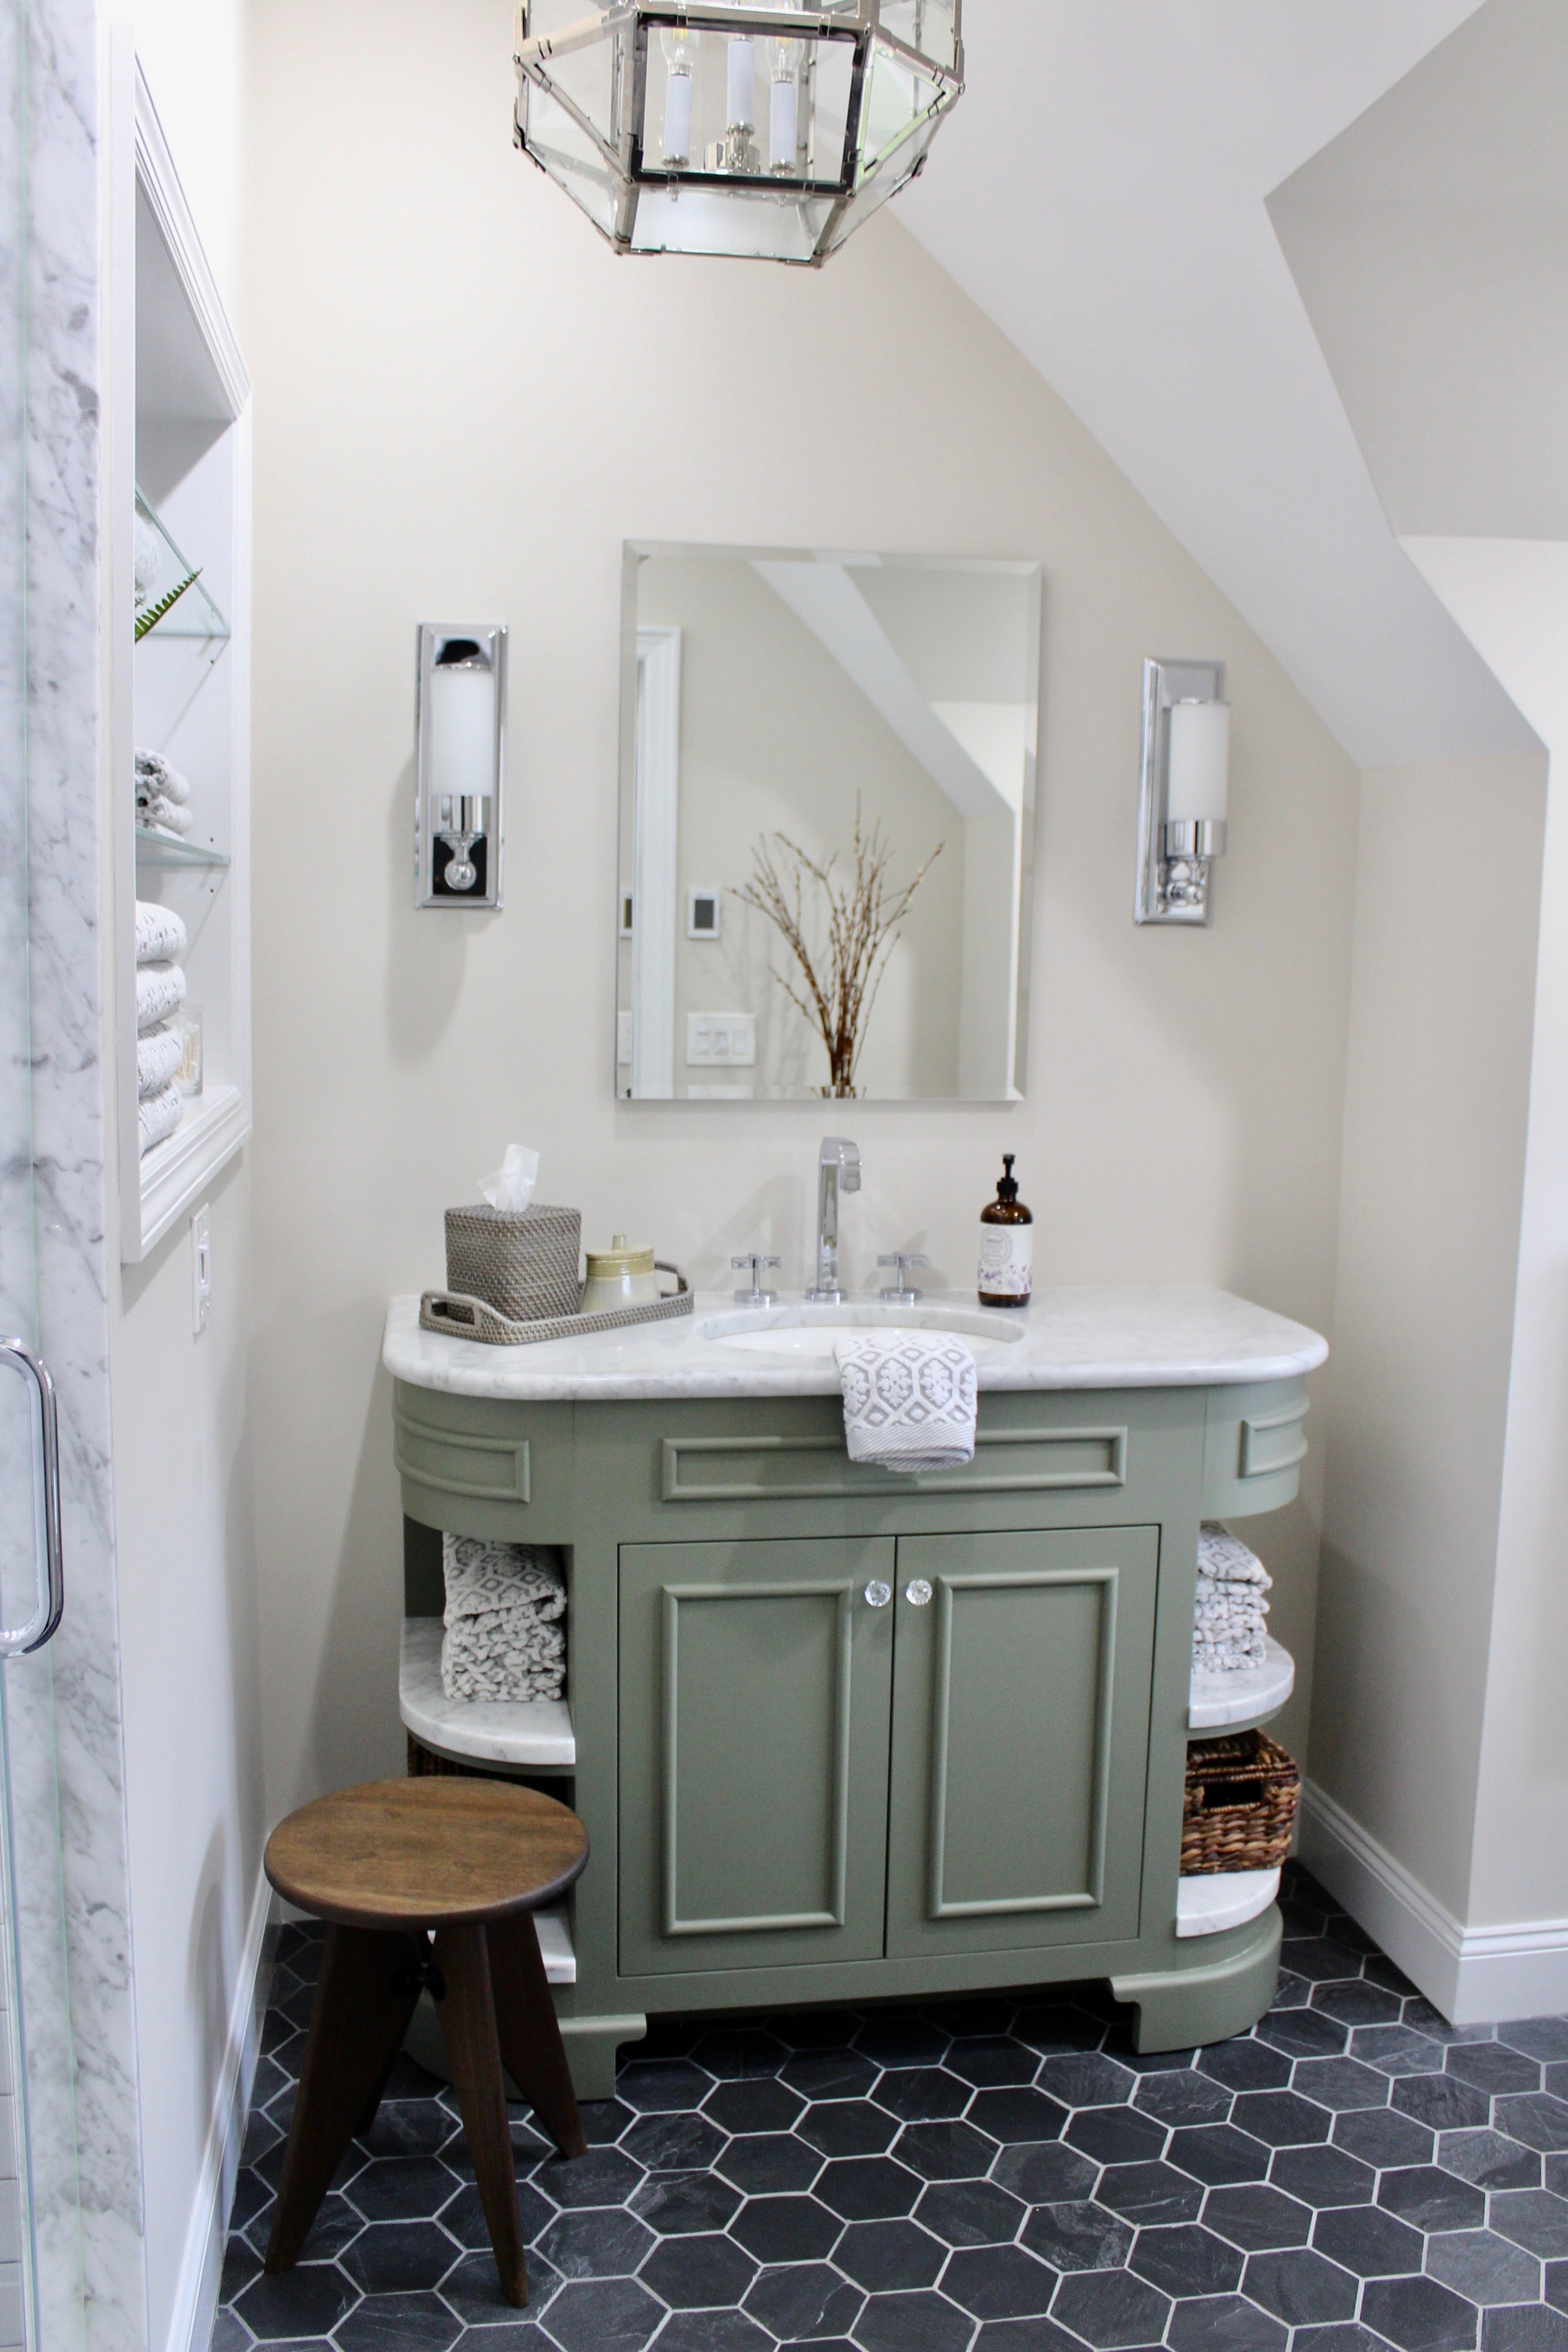 Green Vanity Carrara Marble Top